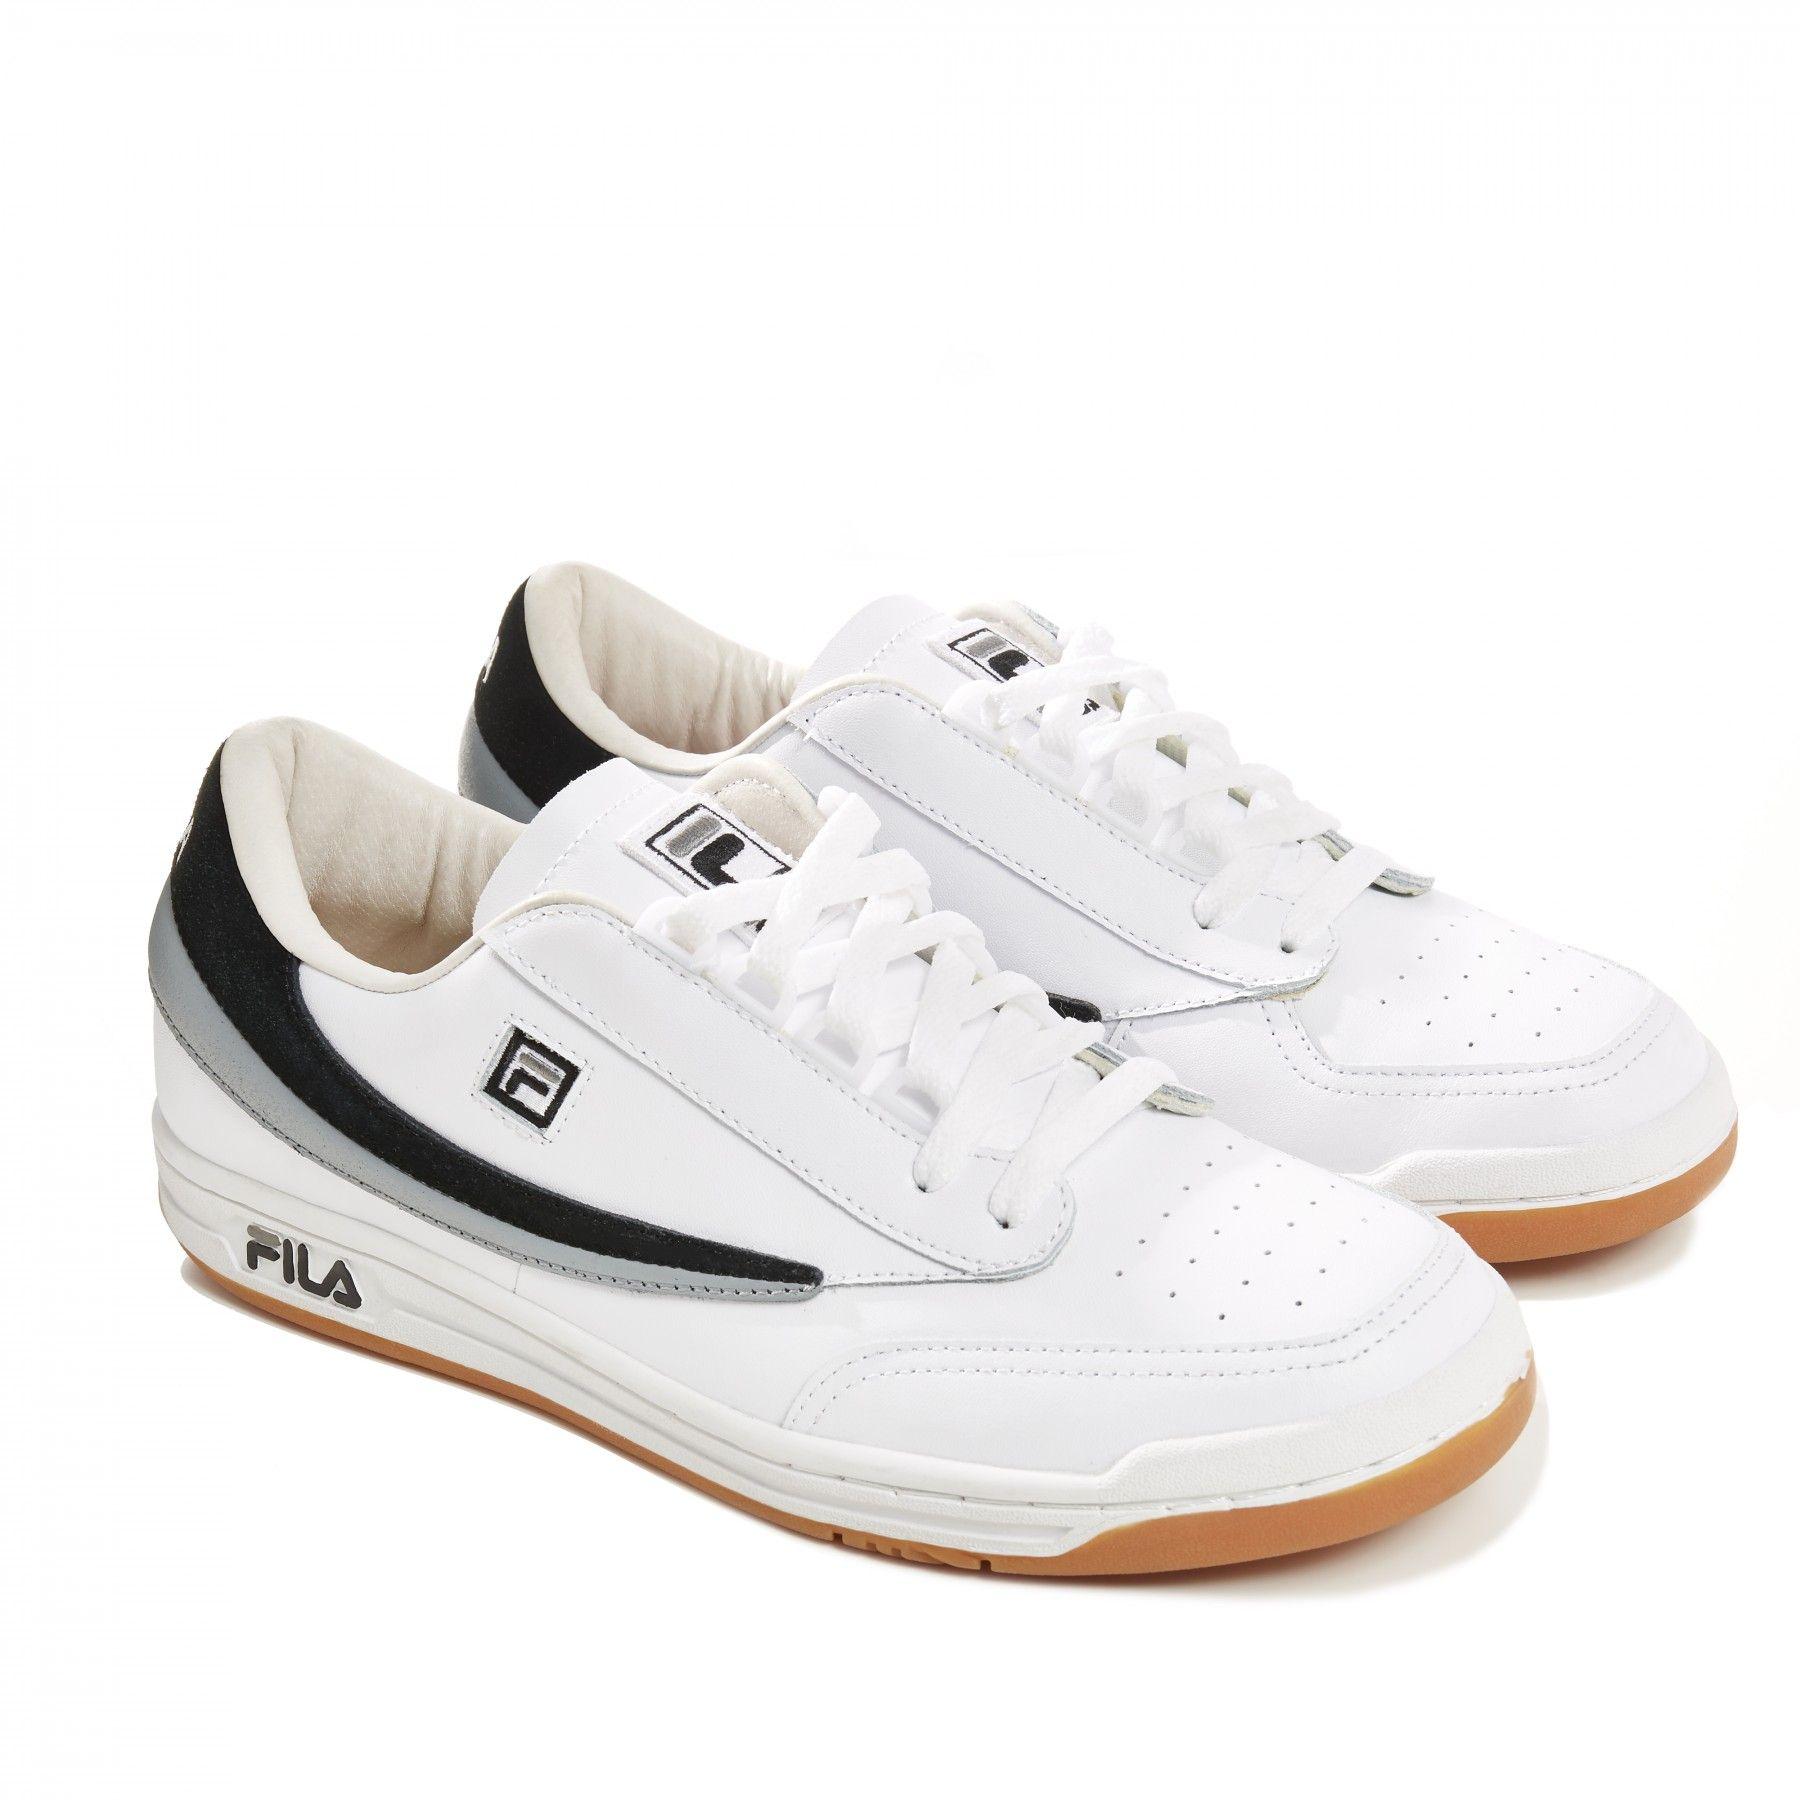 Gosha Rubchinskiy DSM Exclusive Fila Sneakers (White/Black/Grey)